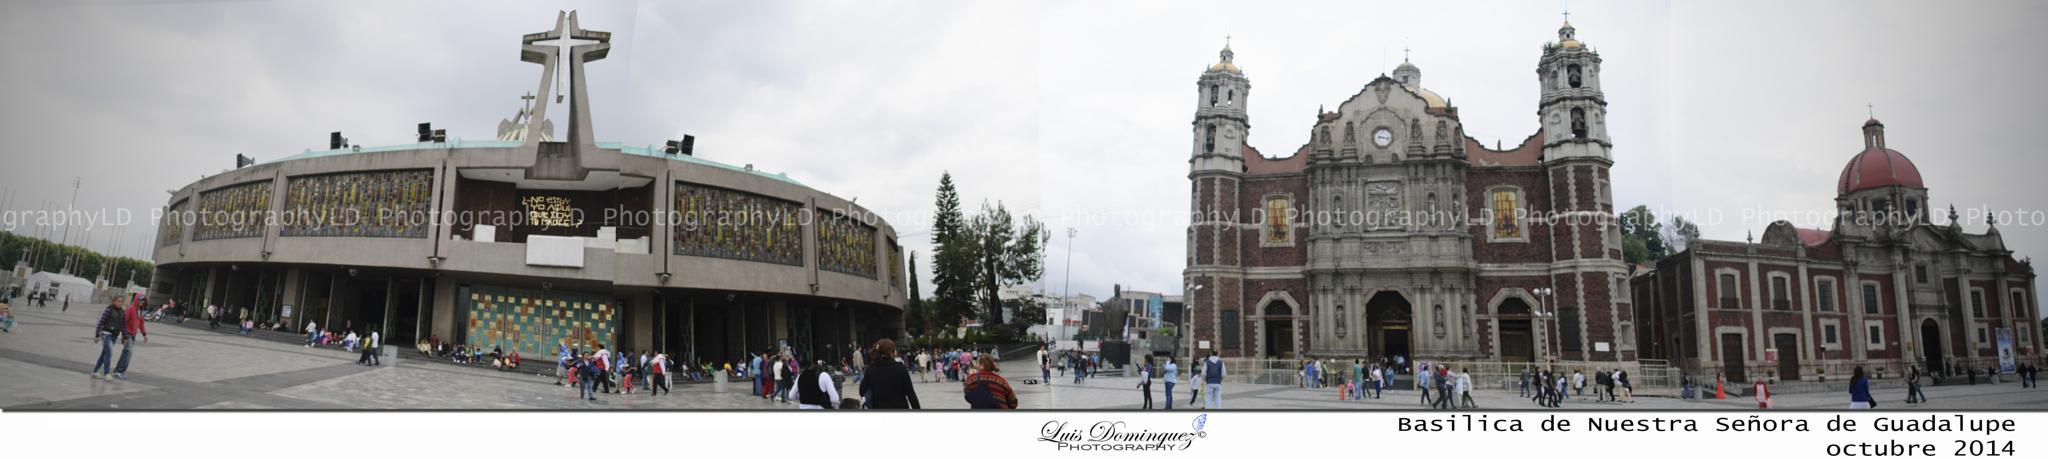 Basilica de Guadalupe by elkalidominguez